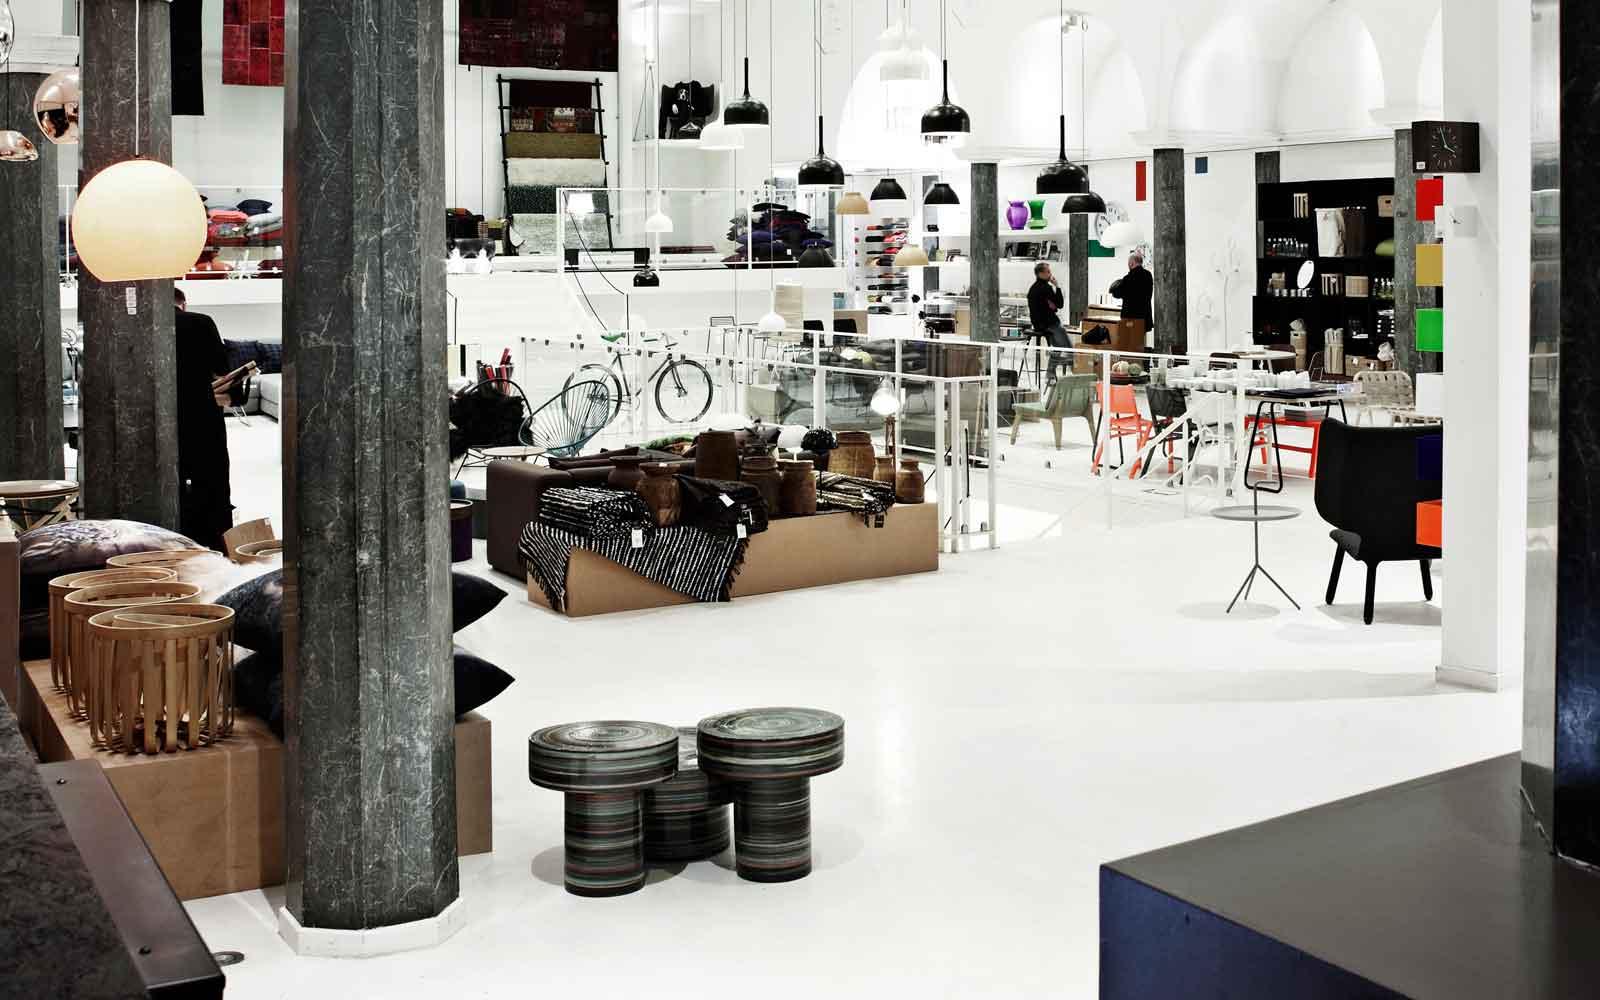 Flagship store for Normann copenhagen shop